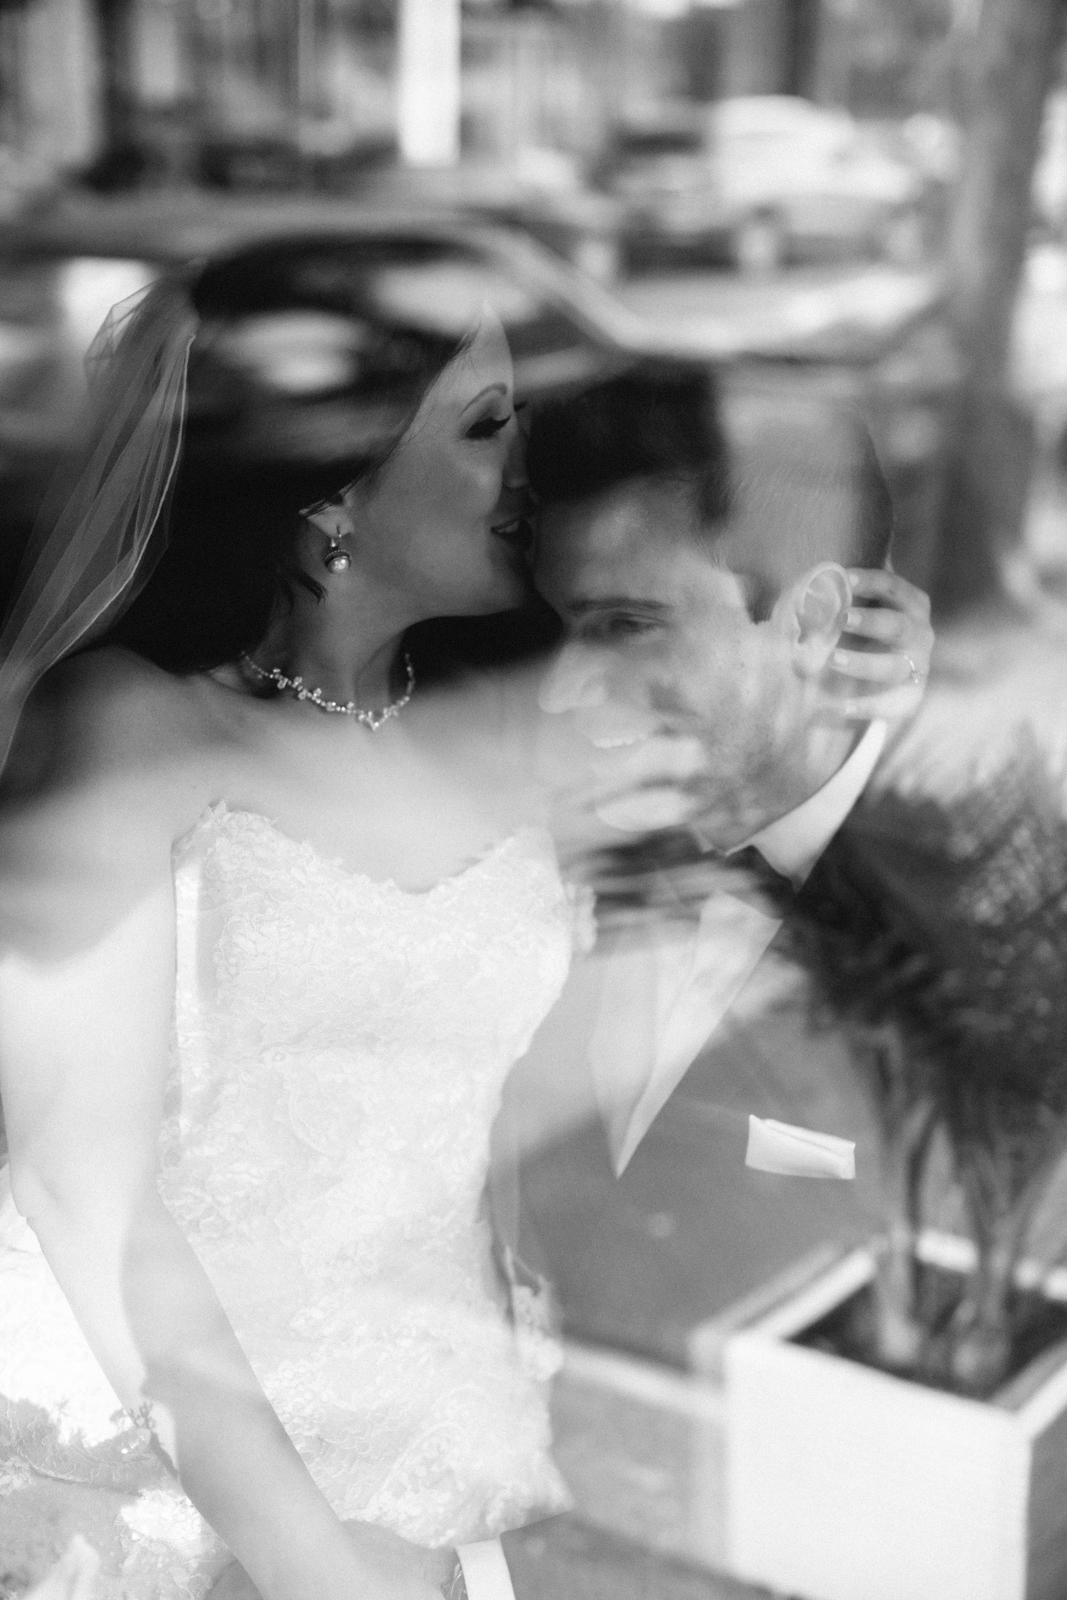 NYC Wedding Photography Lofts at Prince Brooklyn NYC Photographer Boris Zaretsky _B2C0669.jpg